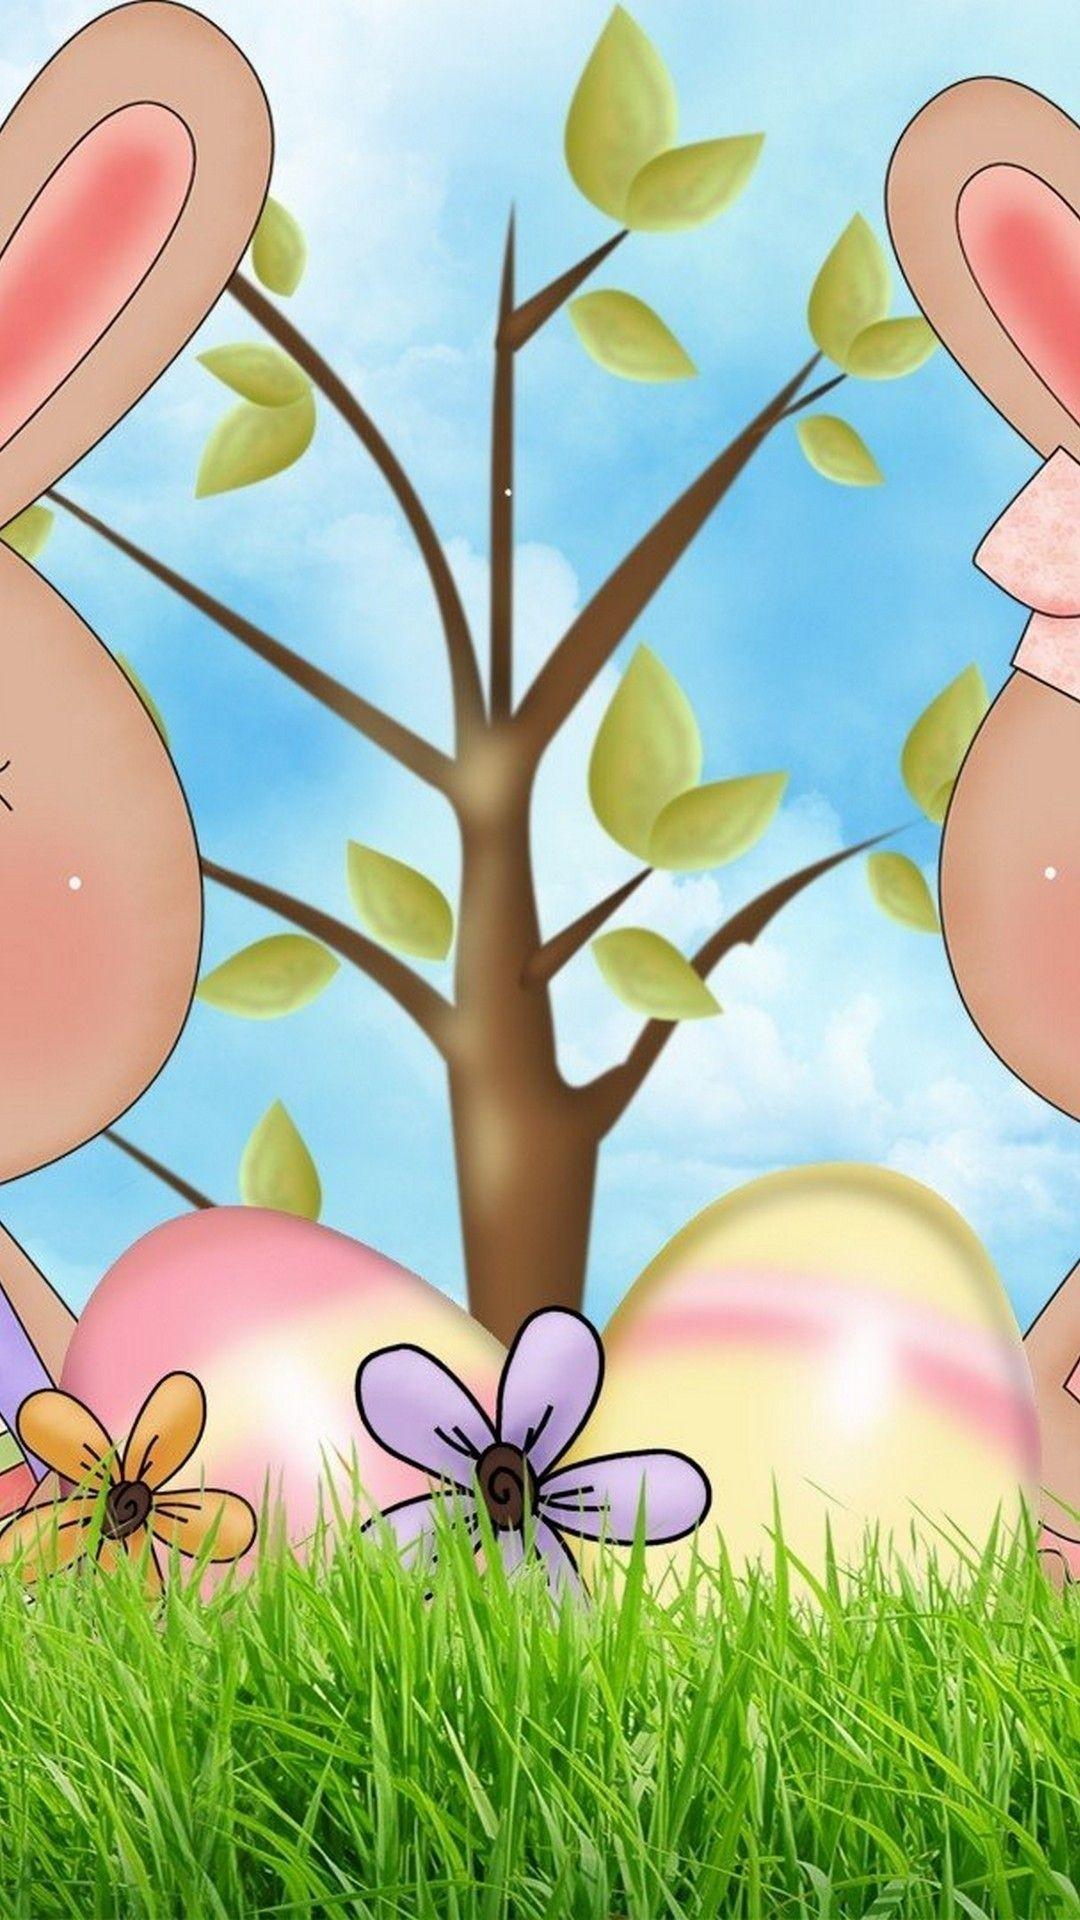 Res: 1080x1920, spring season cartoon images - 10 - g - Spring Season iPhone Wallpaper Best  iPhone Wallpaper